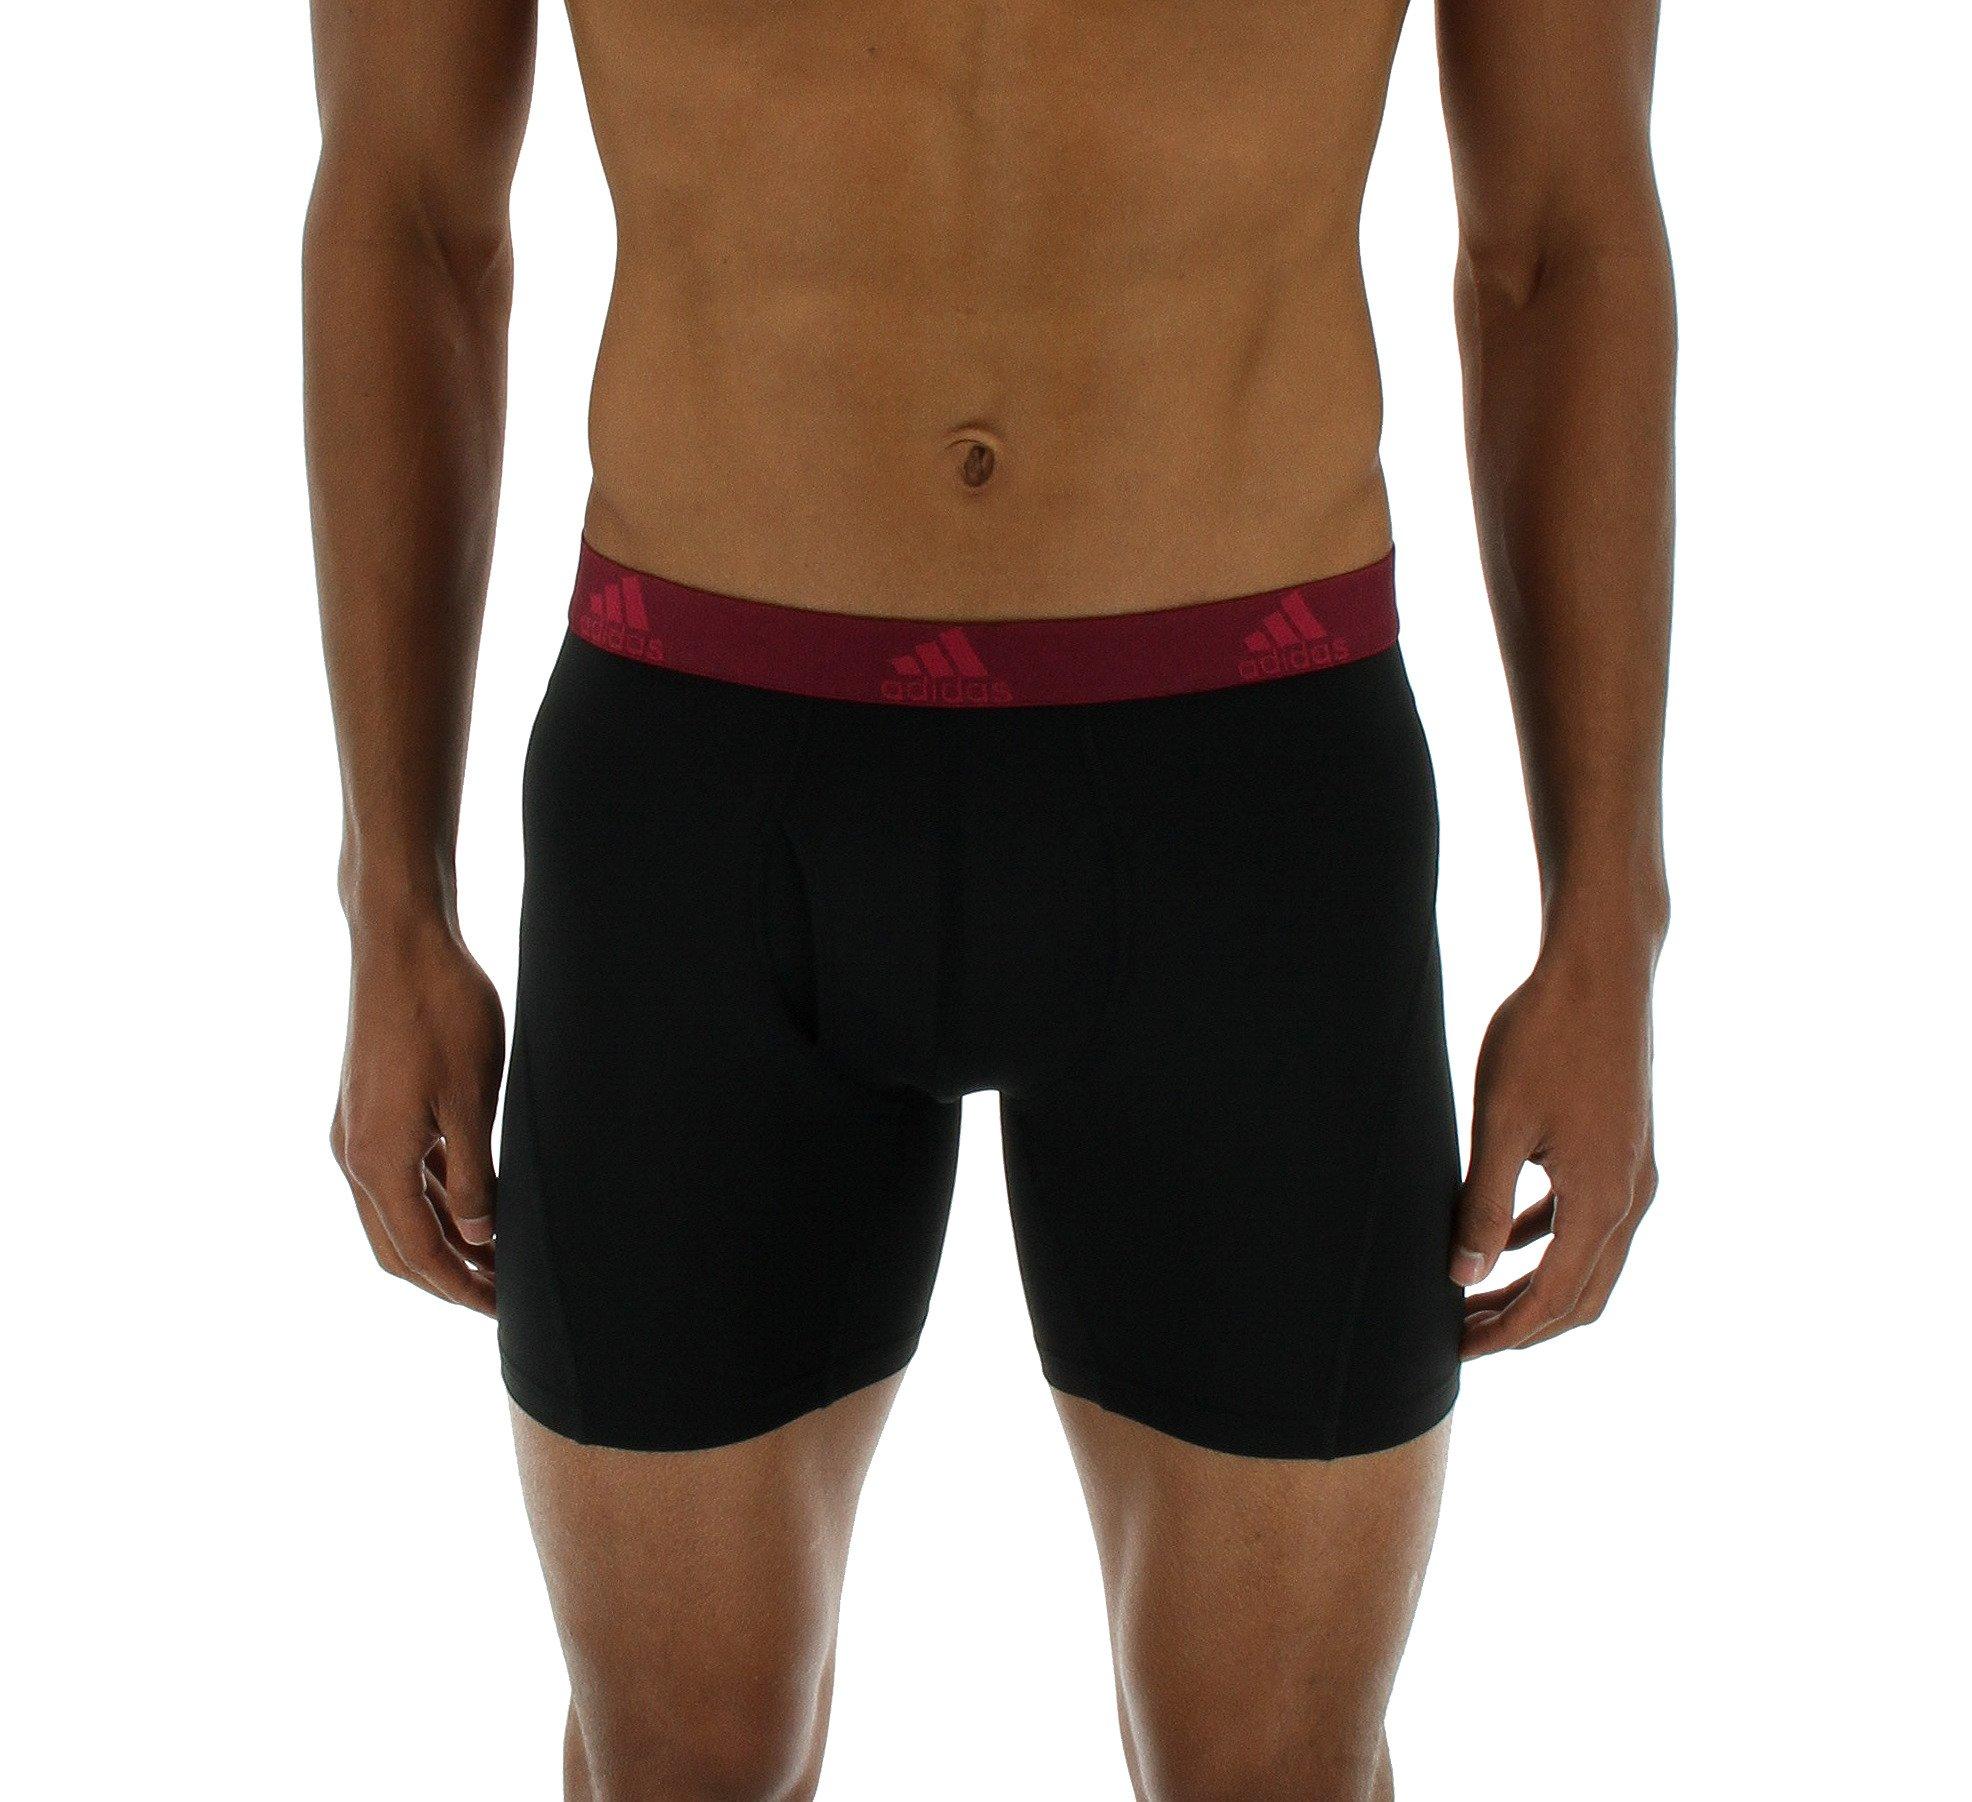 adidas Hombre Relajado Performance Climalite Boxer Breve Ropa Interior (2Unidades)